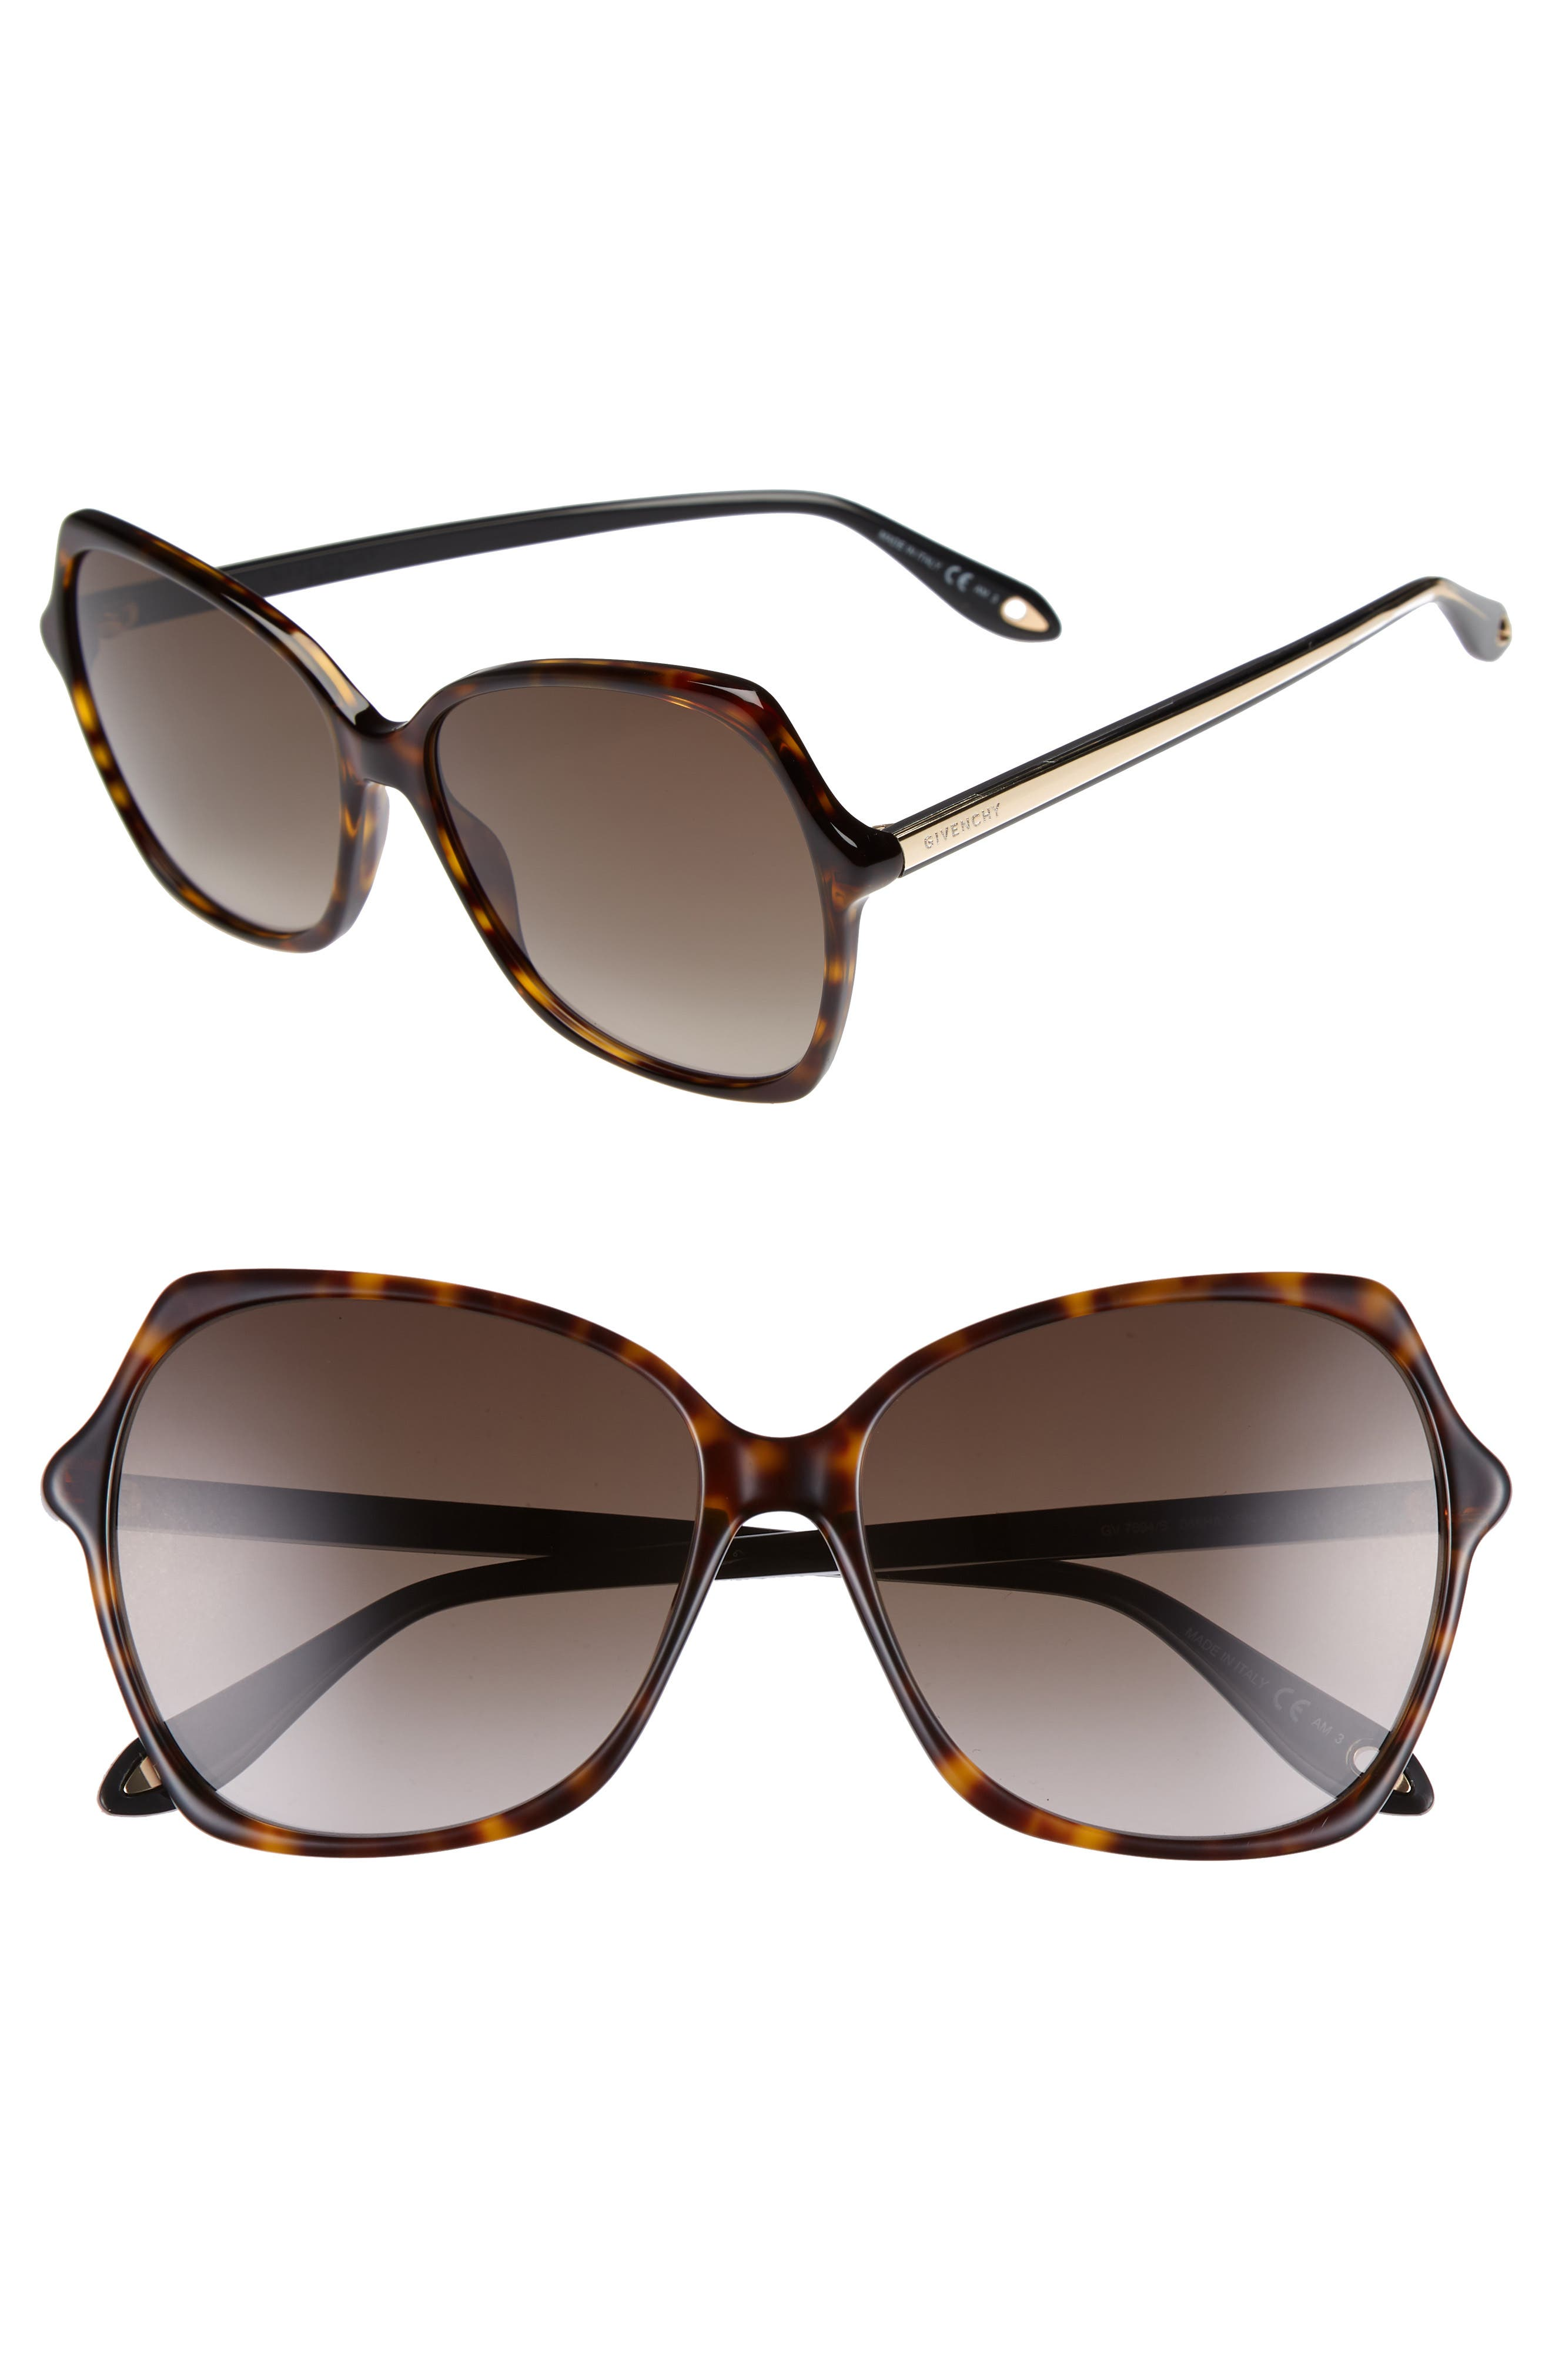 59mm Butterfly Sunglasses,                         Main,                         color, Dark Havana